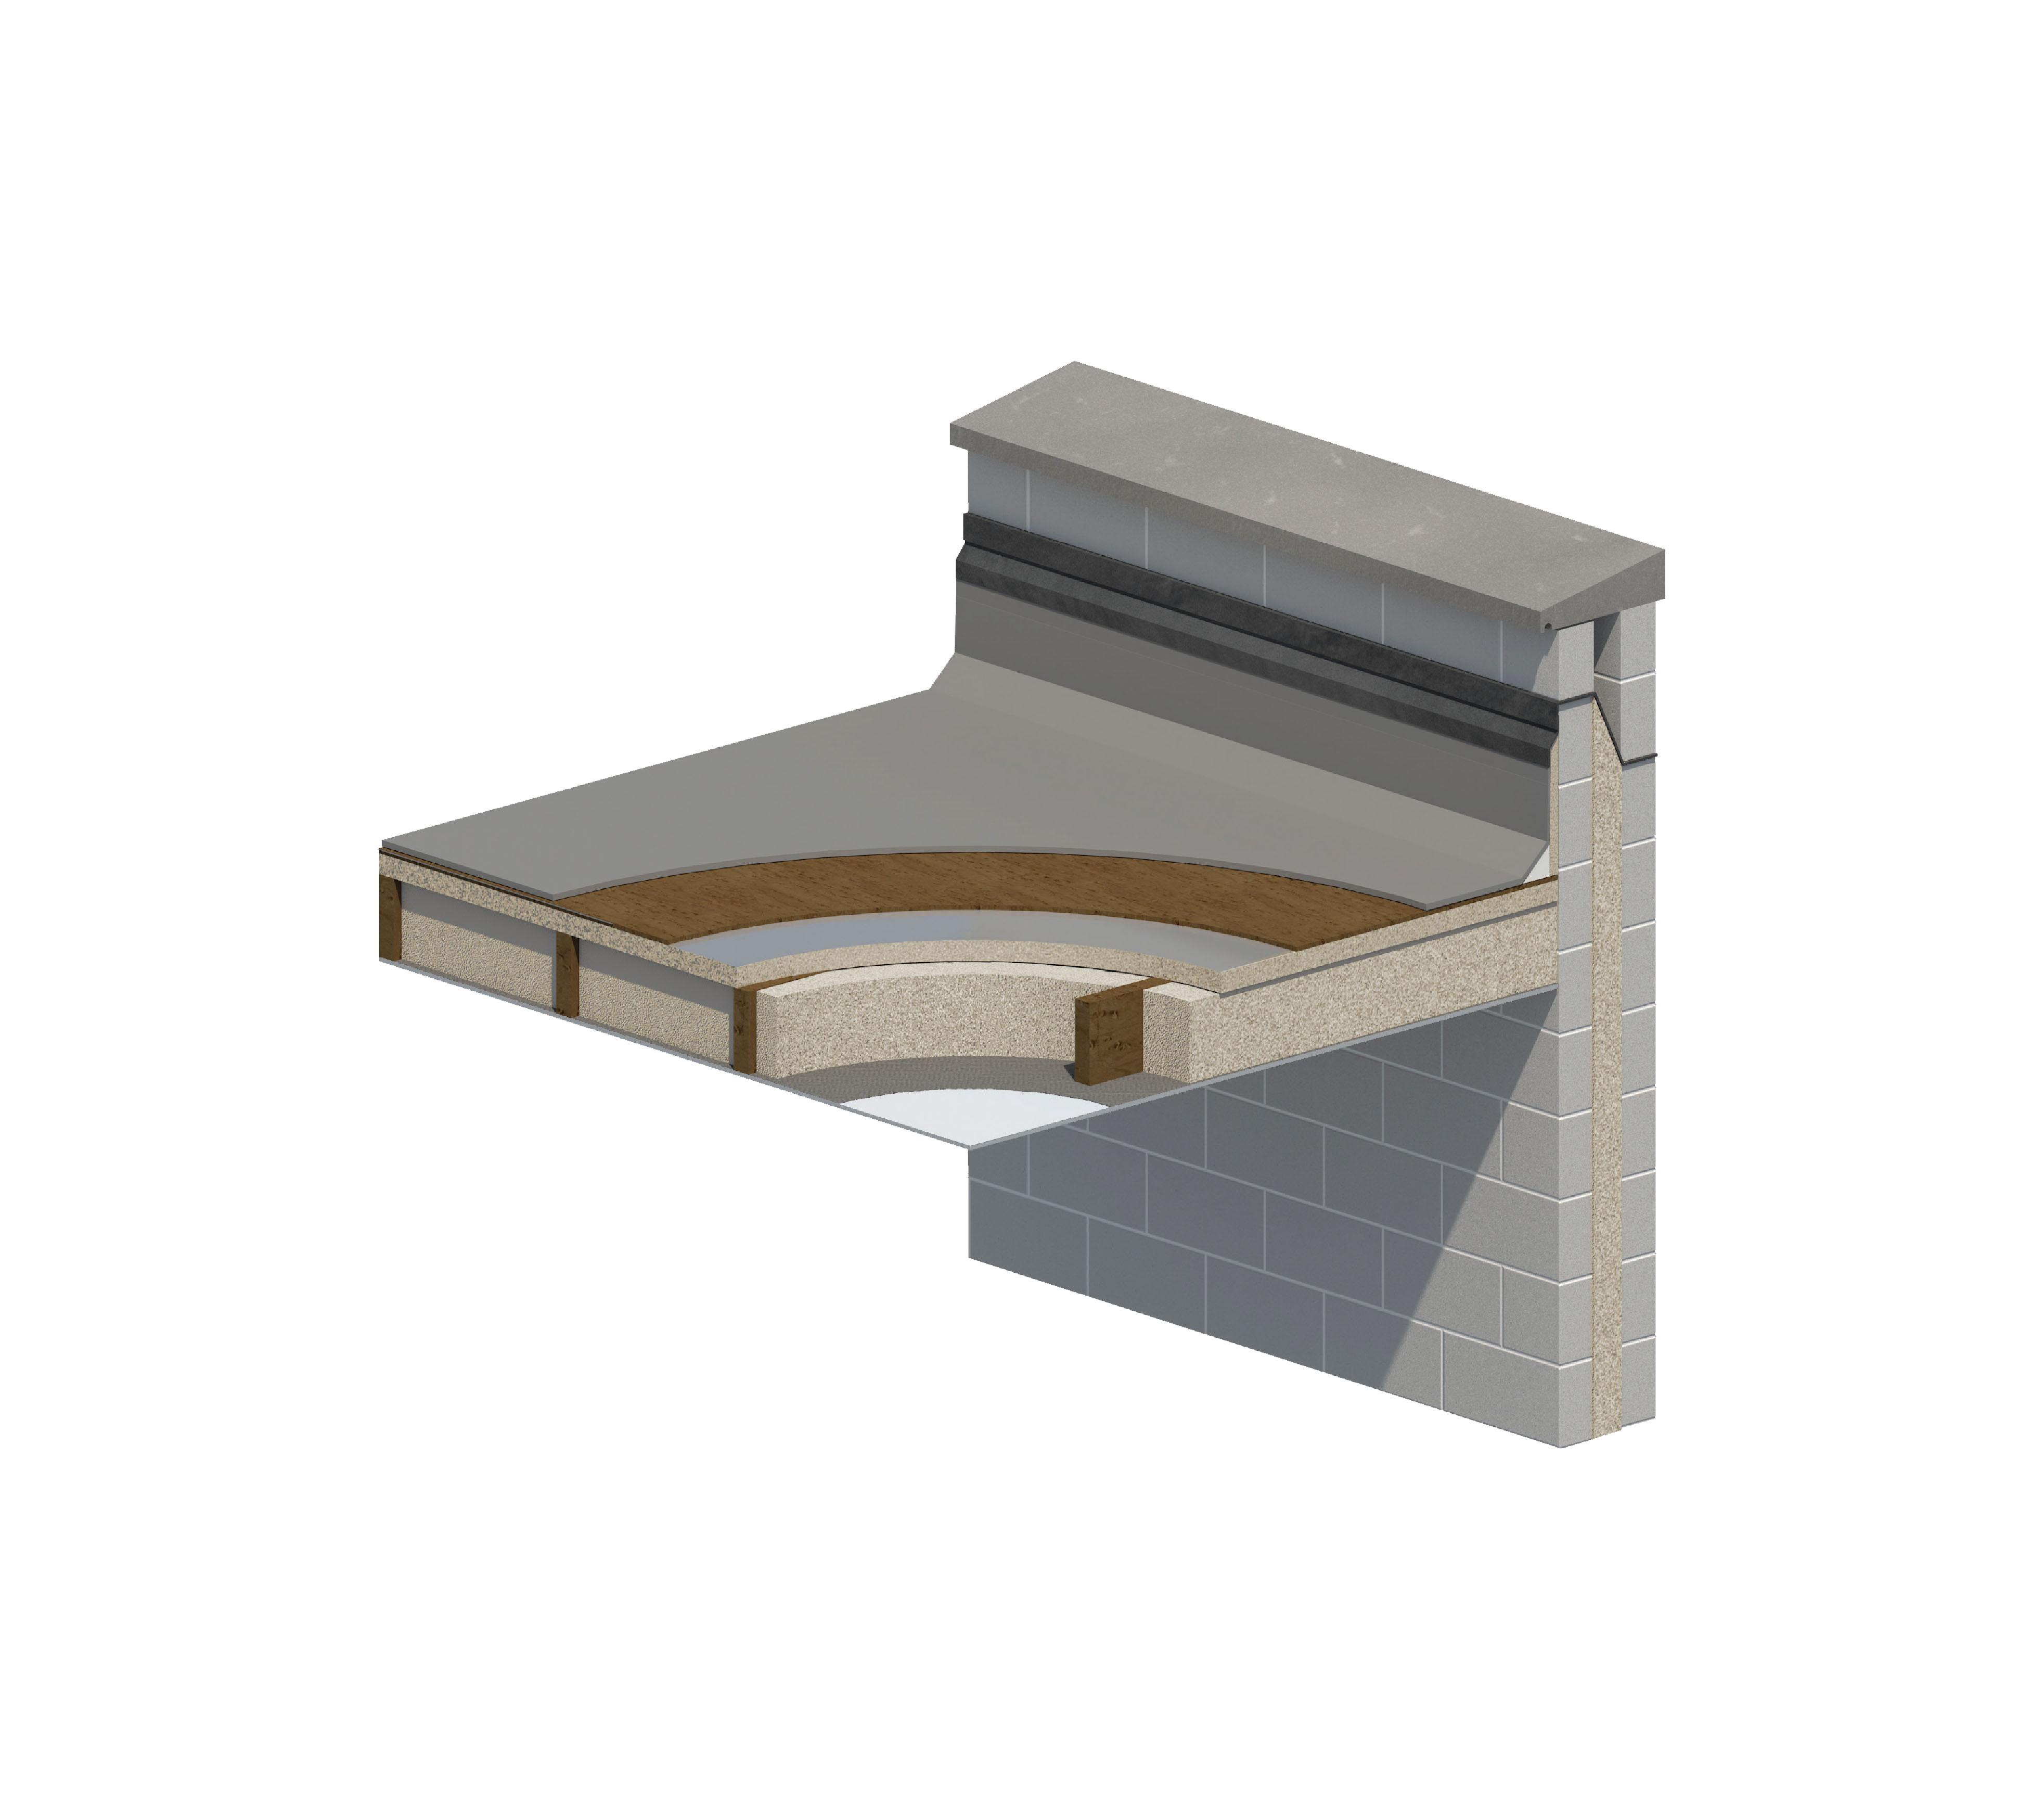 Flat Roof Spray Foam Insulation Home Logic Uk